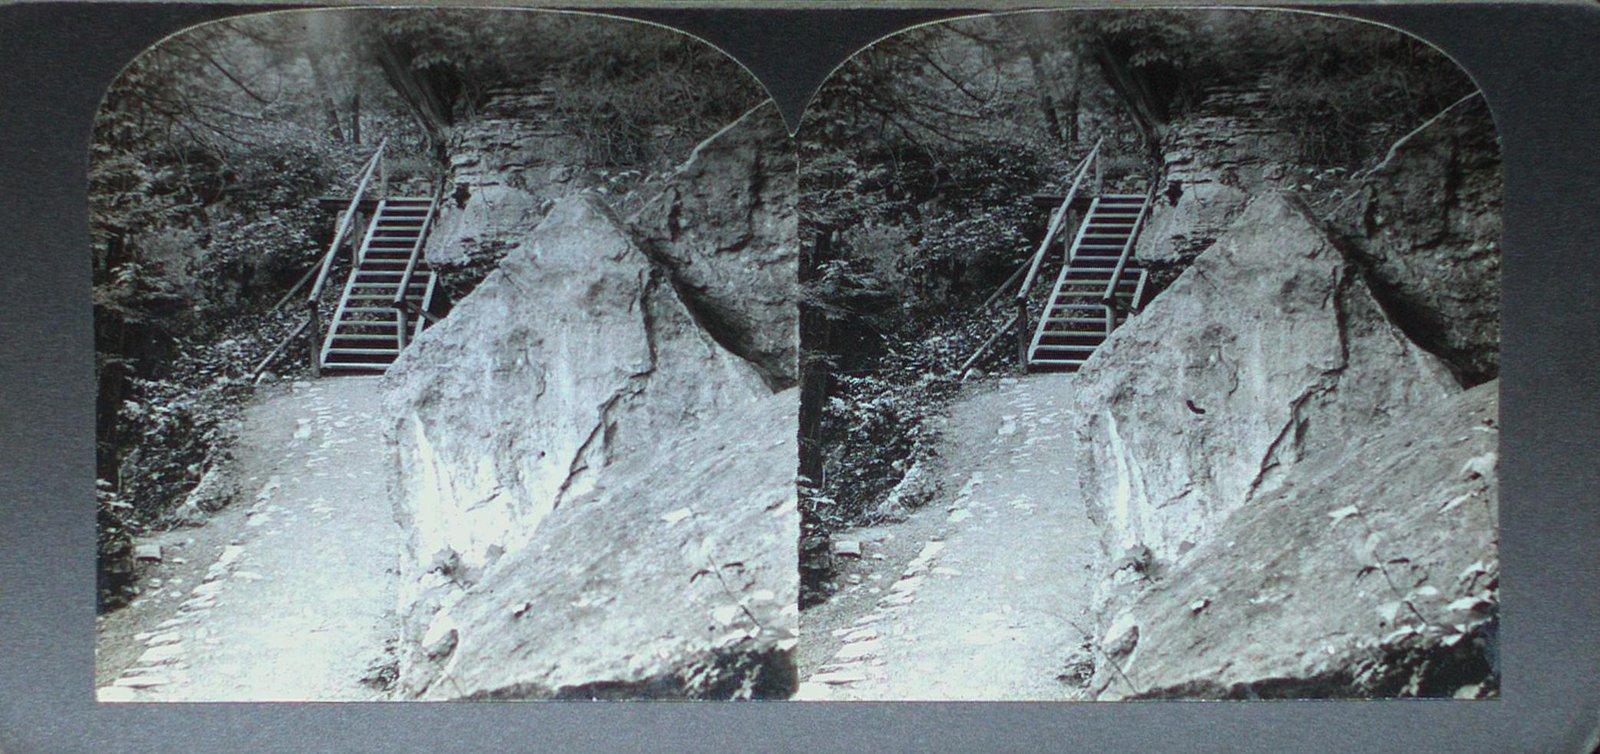 Footpath in Niagara Glen Below the Falls